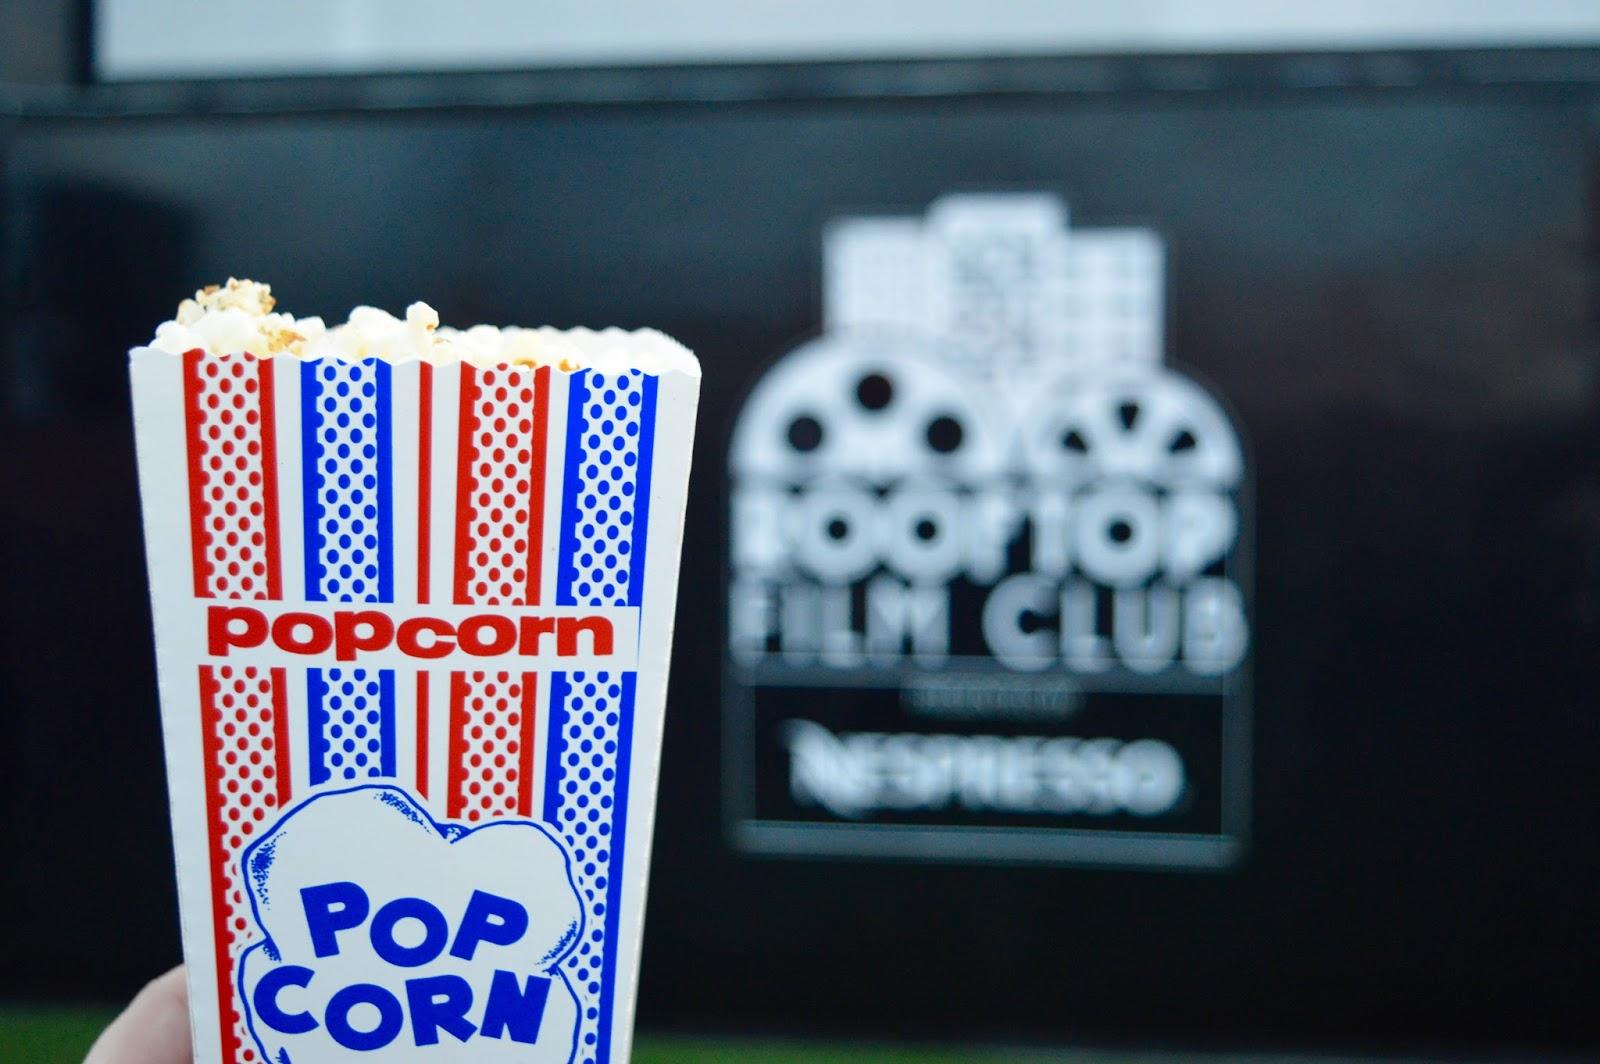 Rooftop Film Club Popcorn